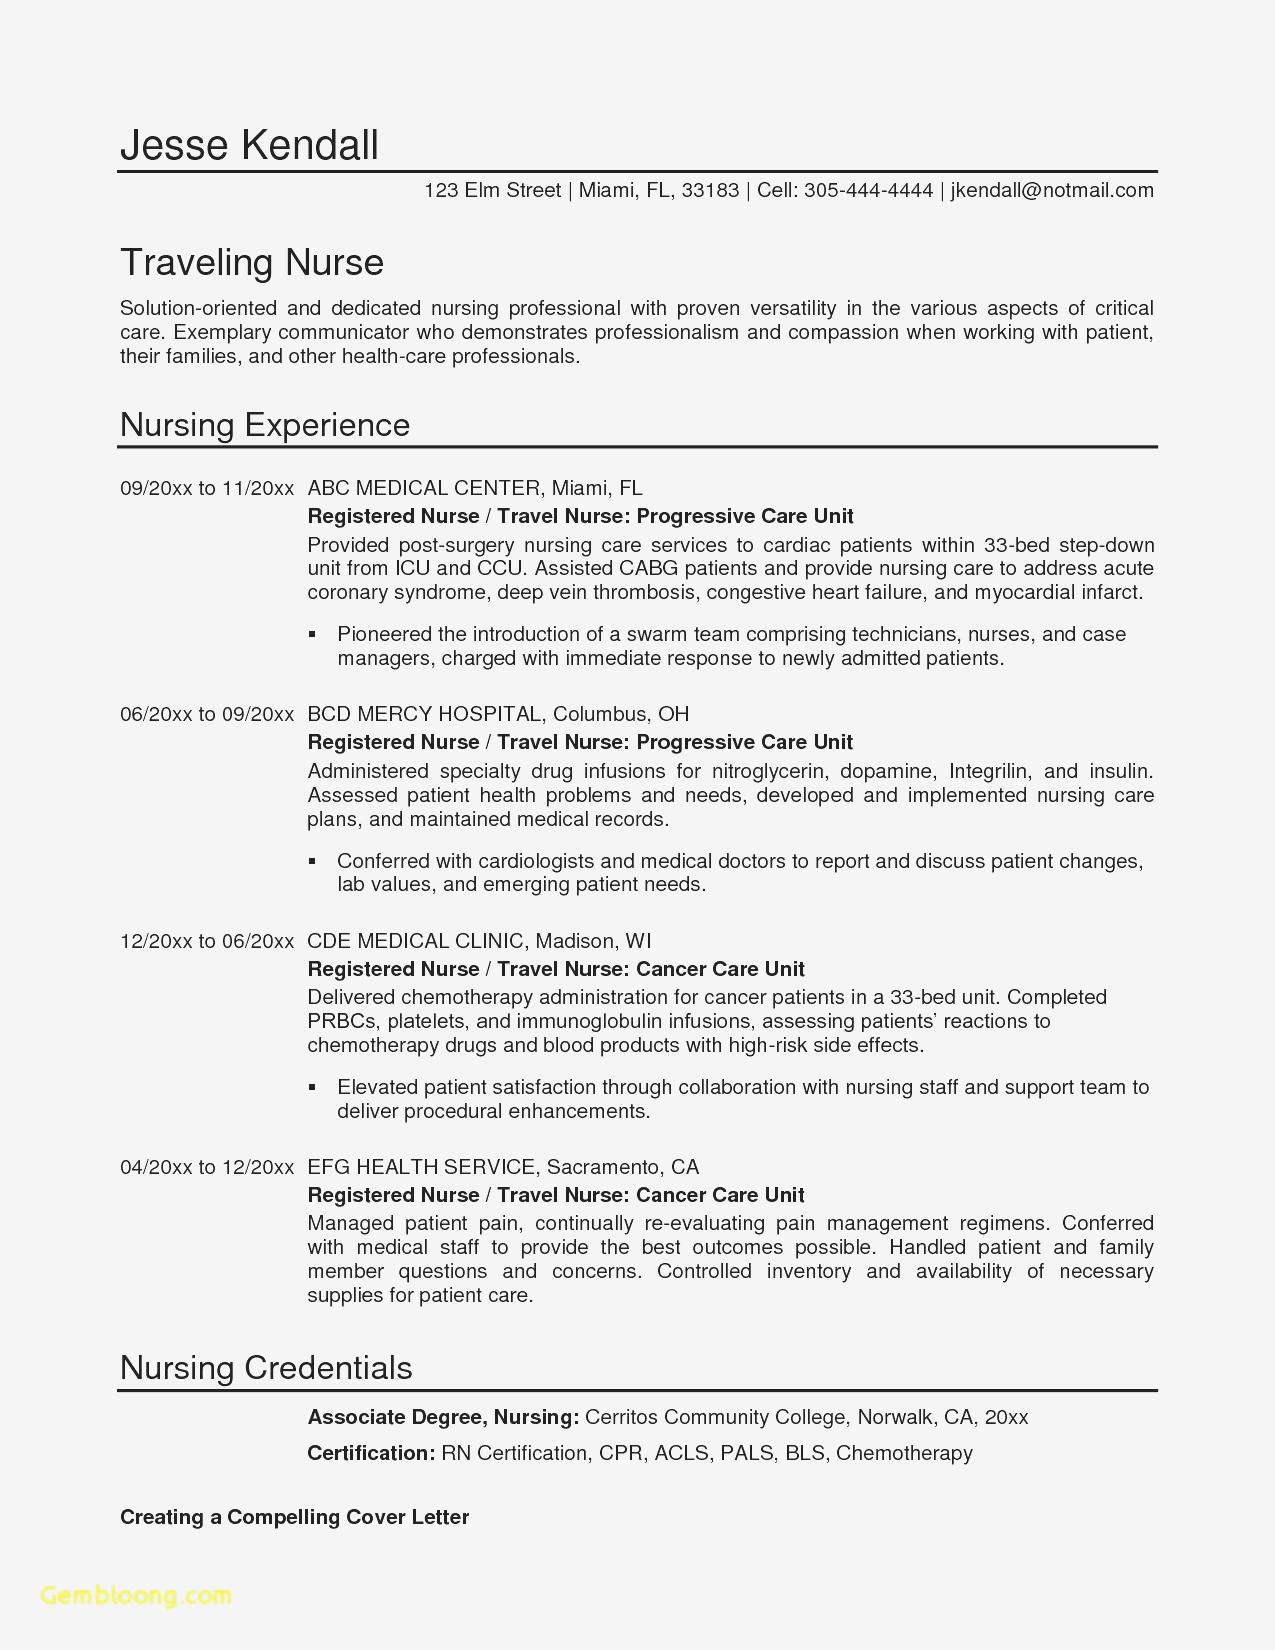 009 Free Printable Cover Letter Templates Resumeft Word Best Awesome - Free Printable Cover Letter Templates